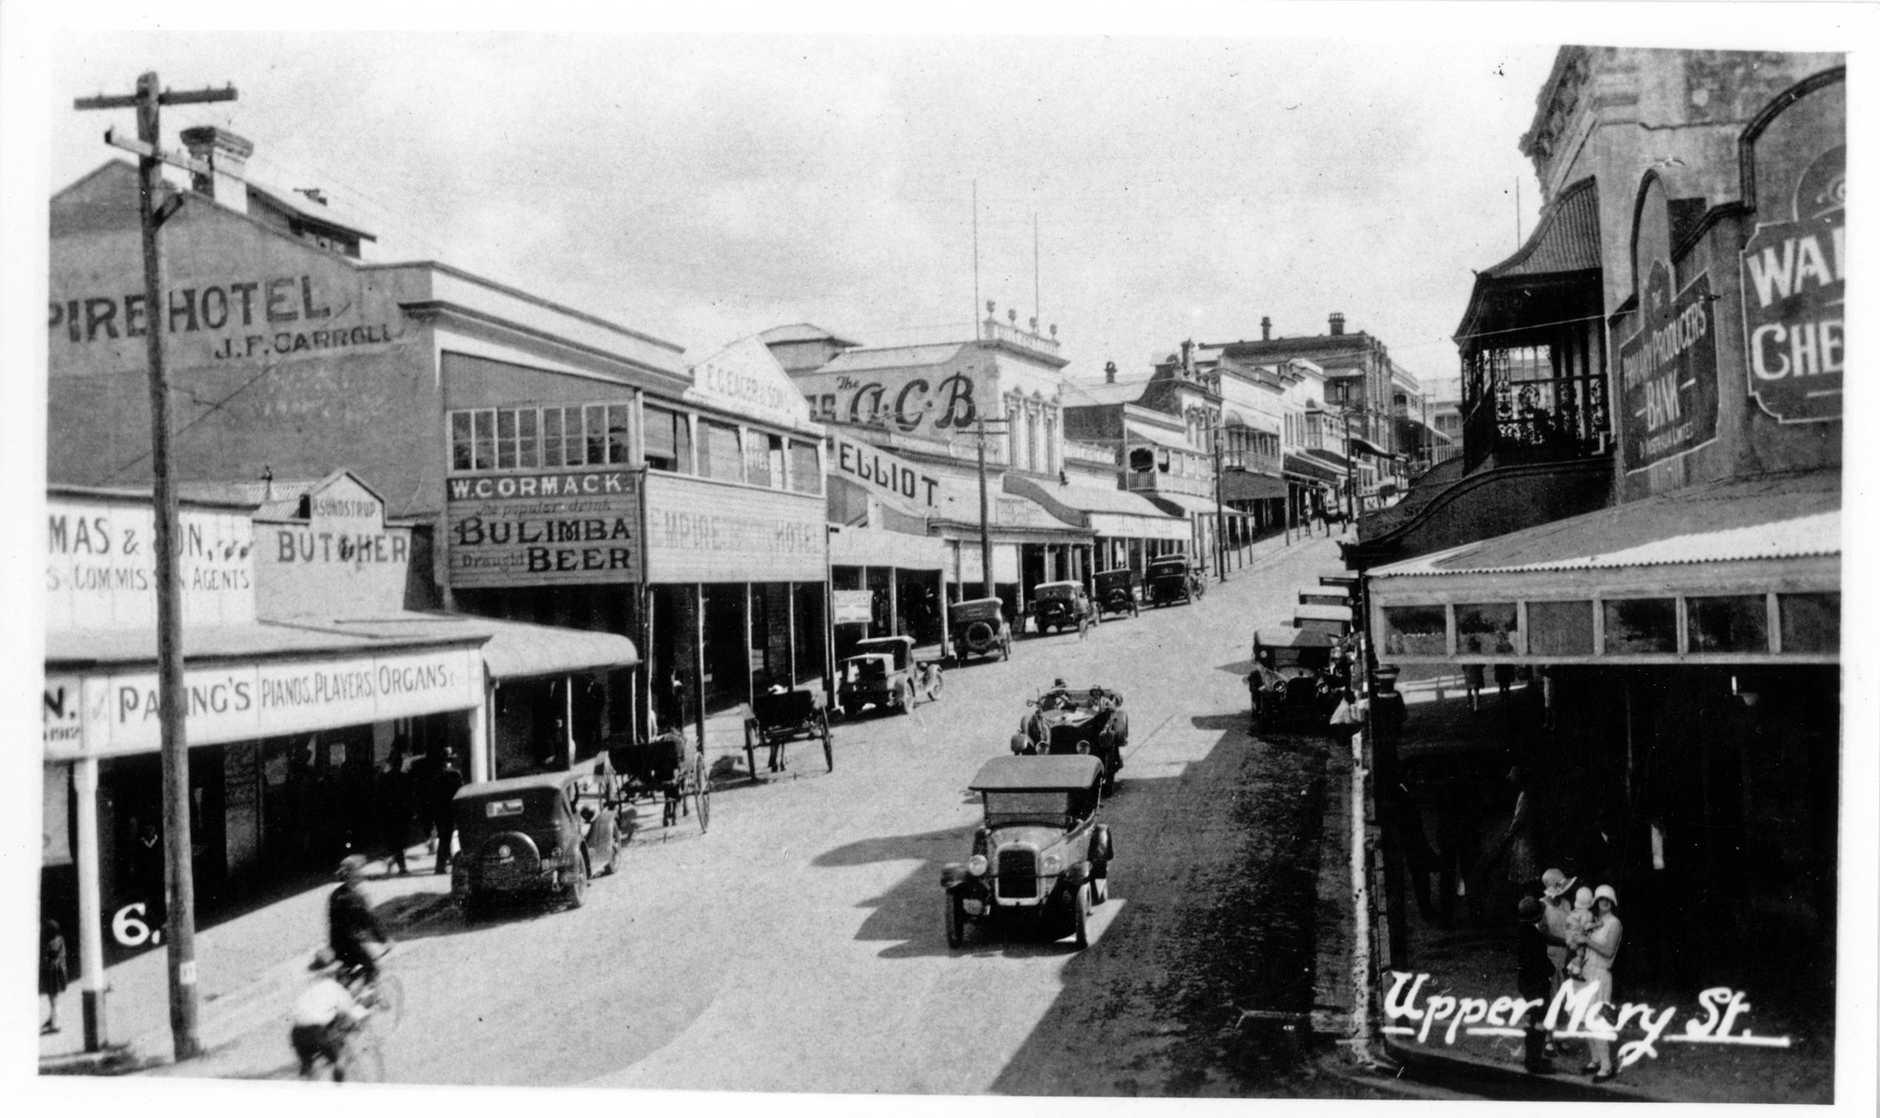 Empire Hotel, Gympie. Upper Mary Street c1920's Photo Courtesy of Gympie Regional Library.